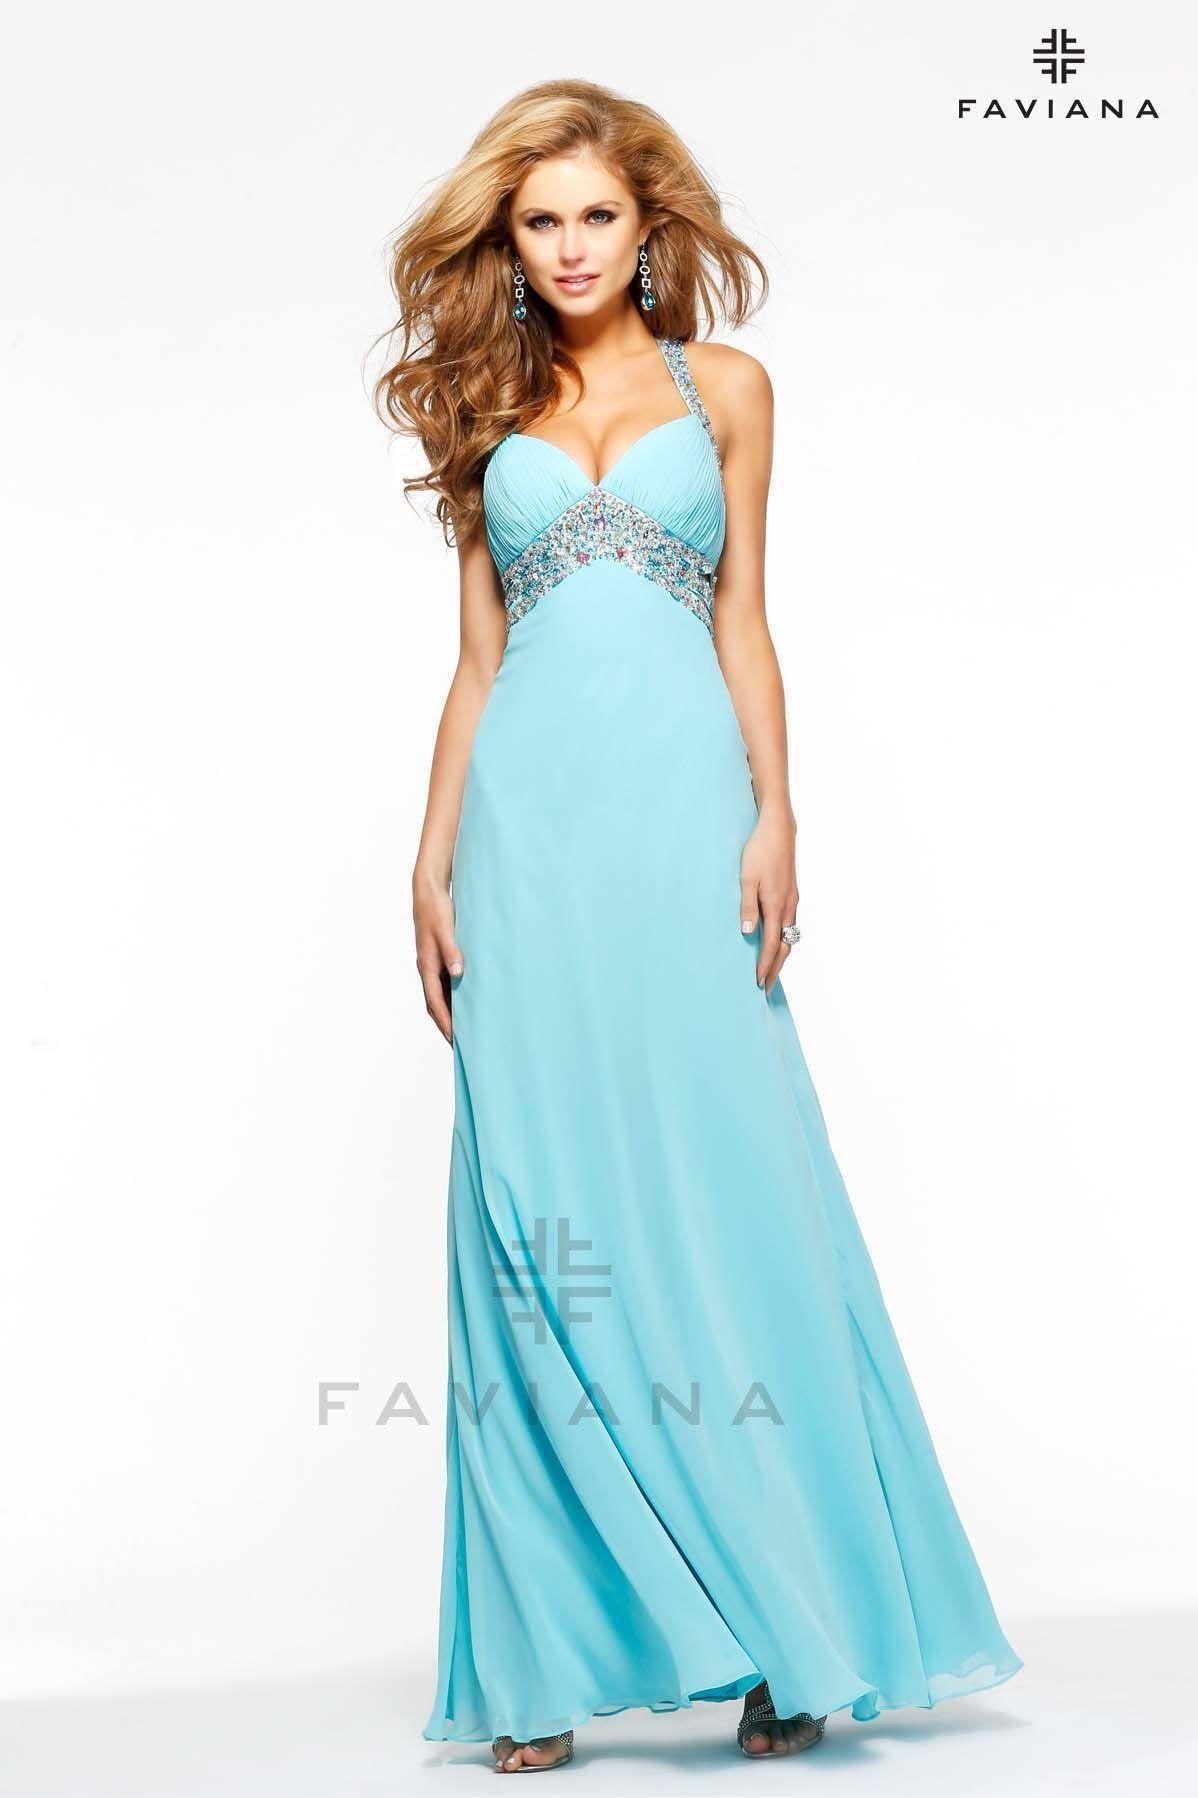 Faviana Beaded Chiffon with side cut outs - Party Dresses | Faviana ...